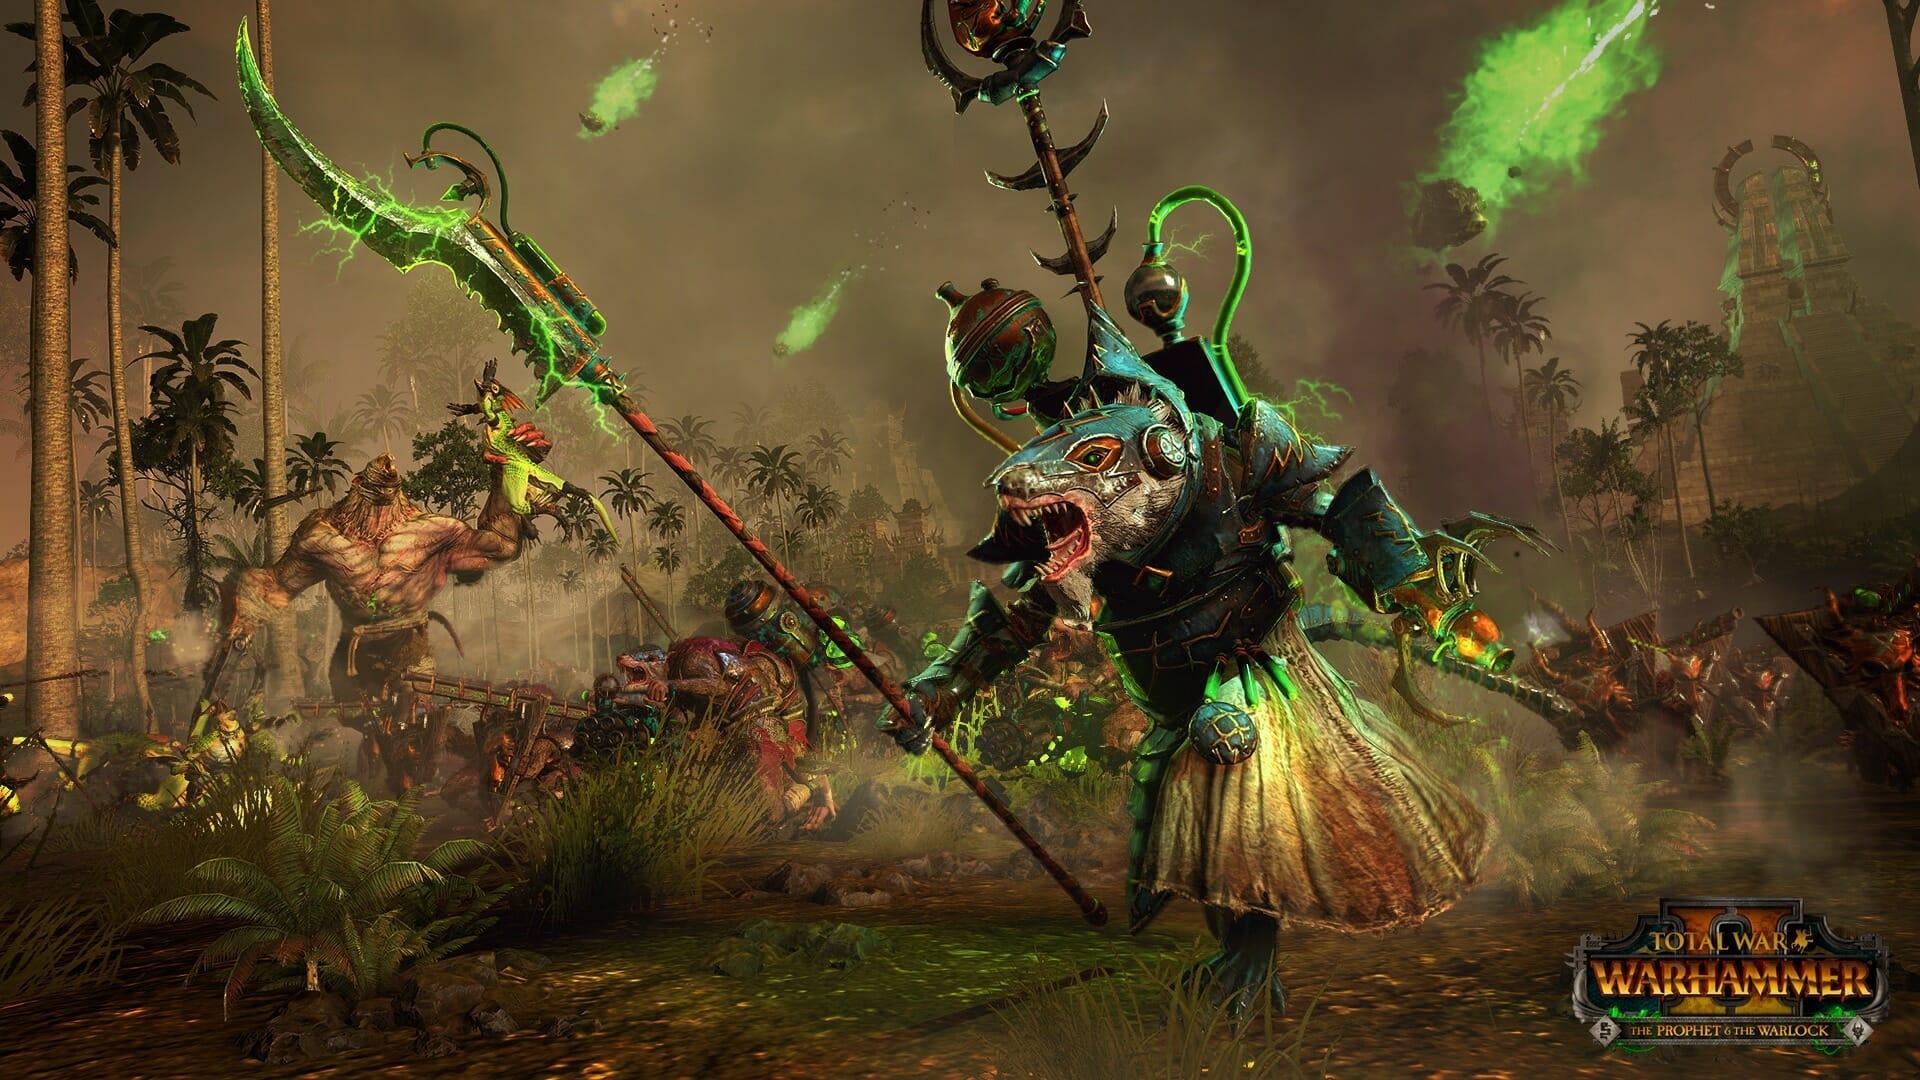 Total War Warhammer Ii The Prophet Amp The Warlock